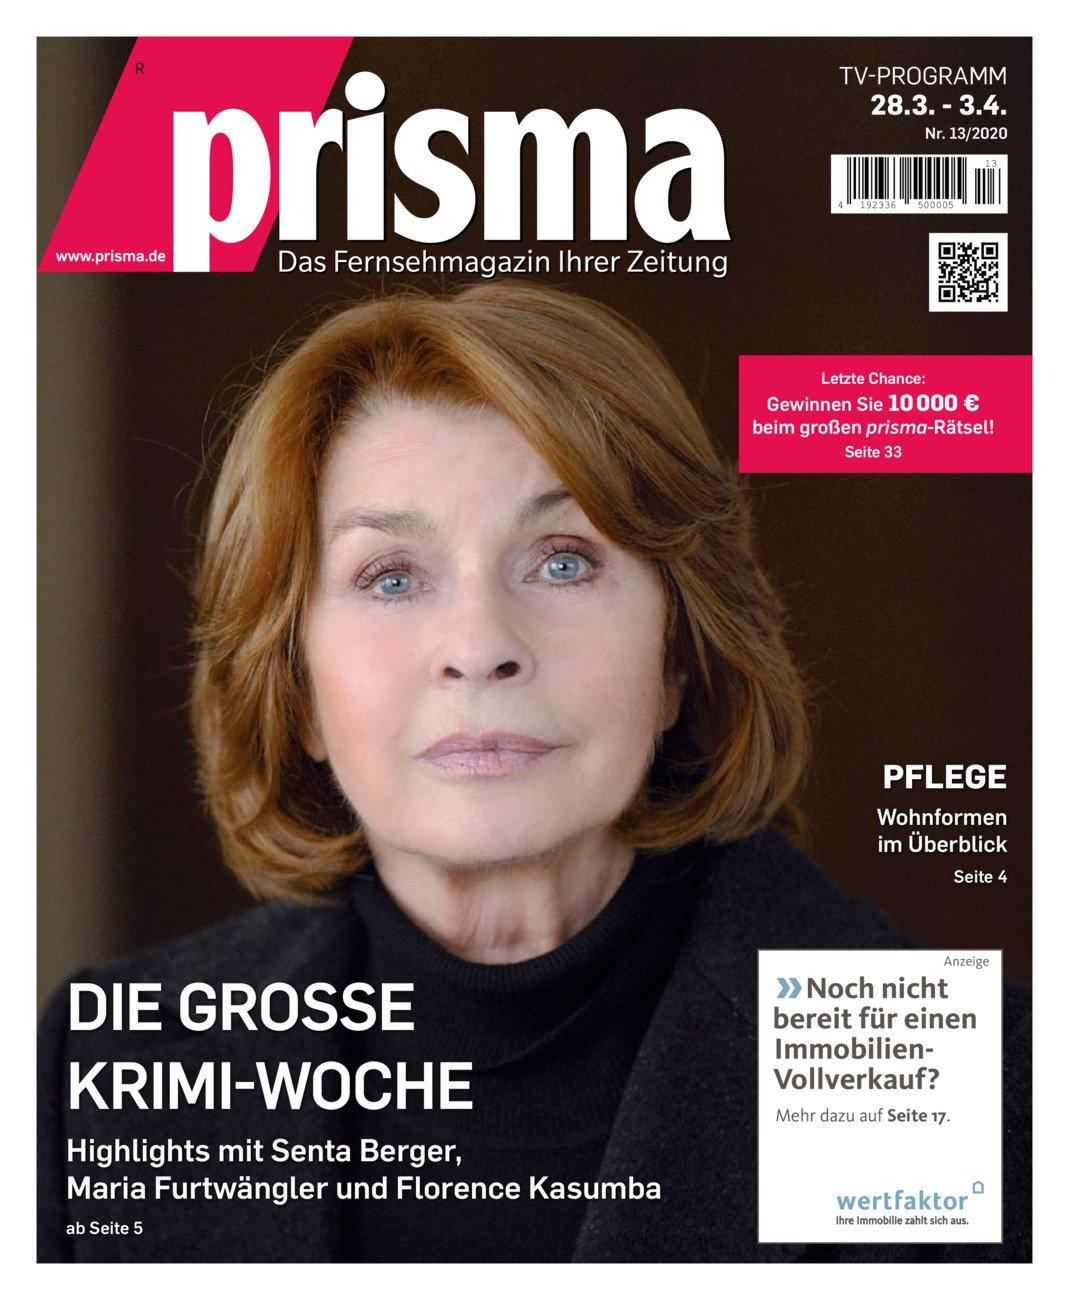 Prisma 28.3 - 3.4